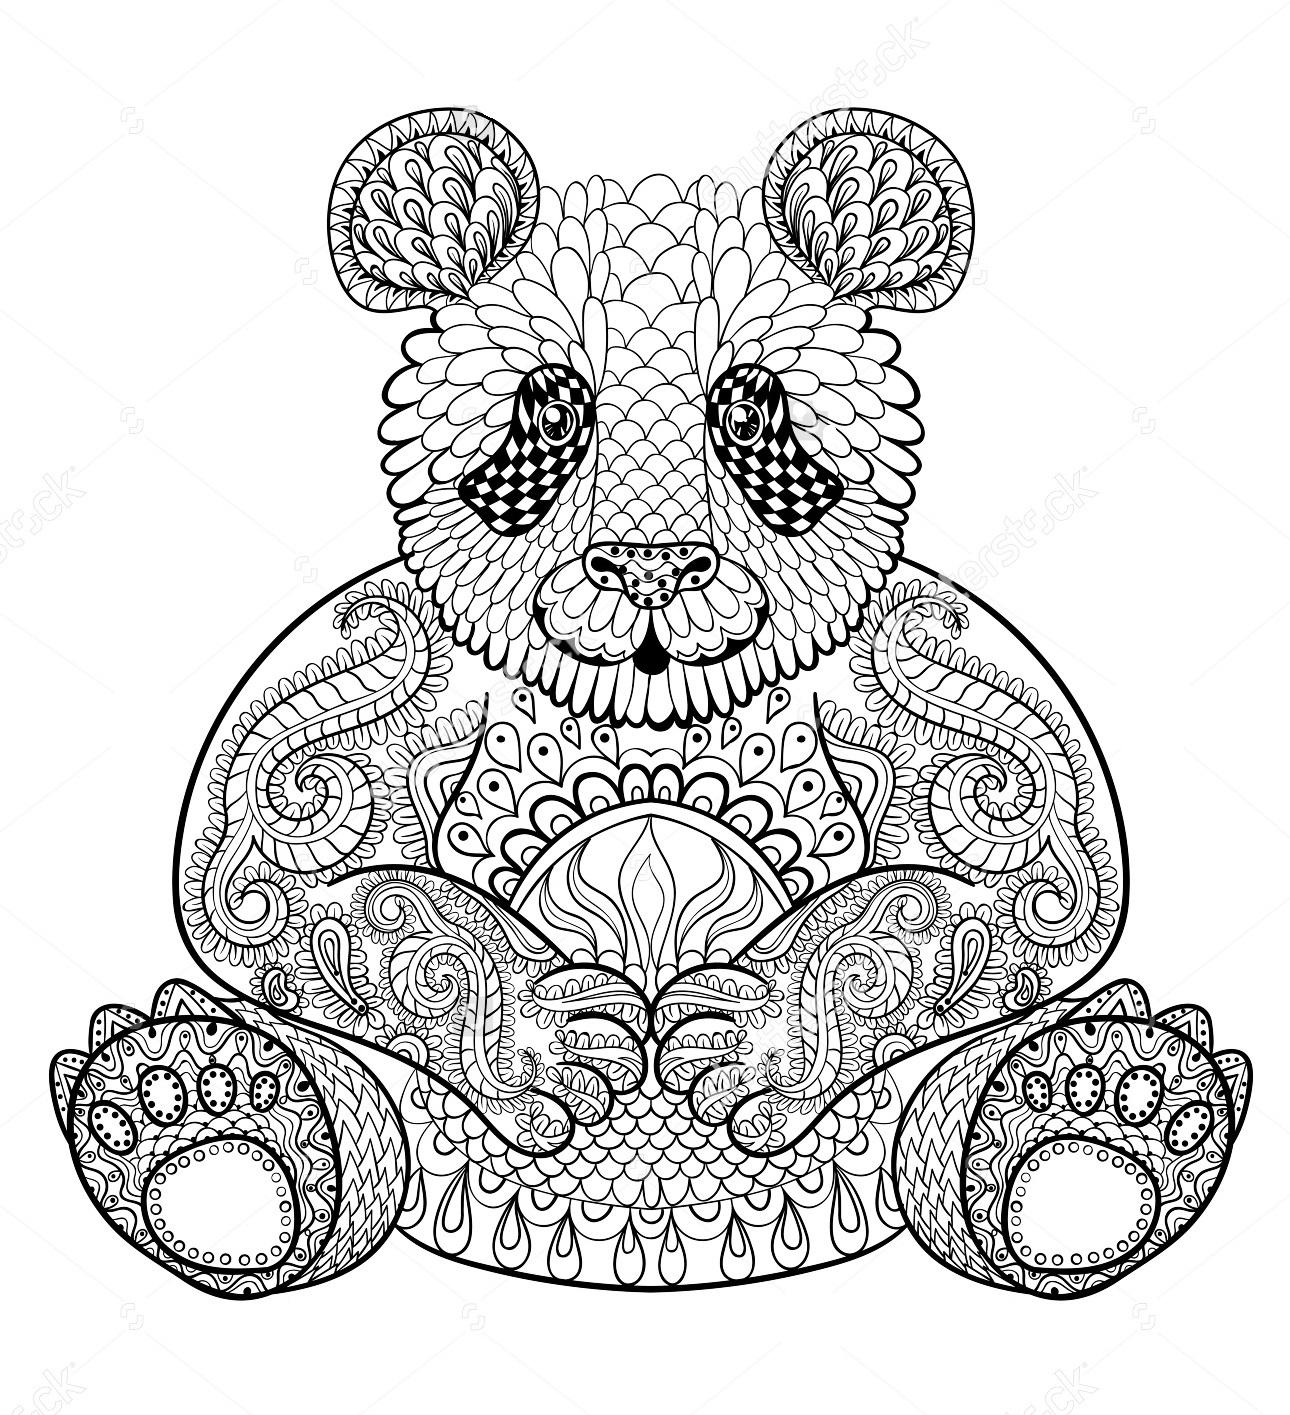 zentangle-panda-print-out-drawing